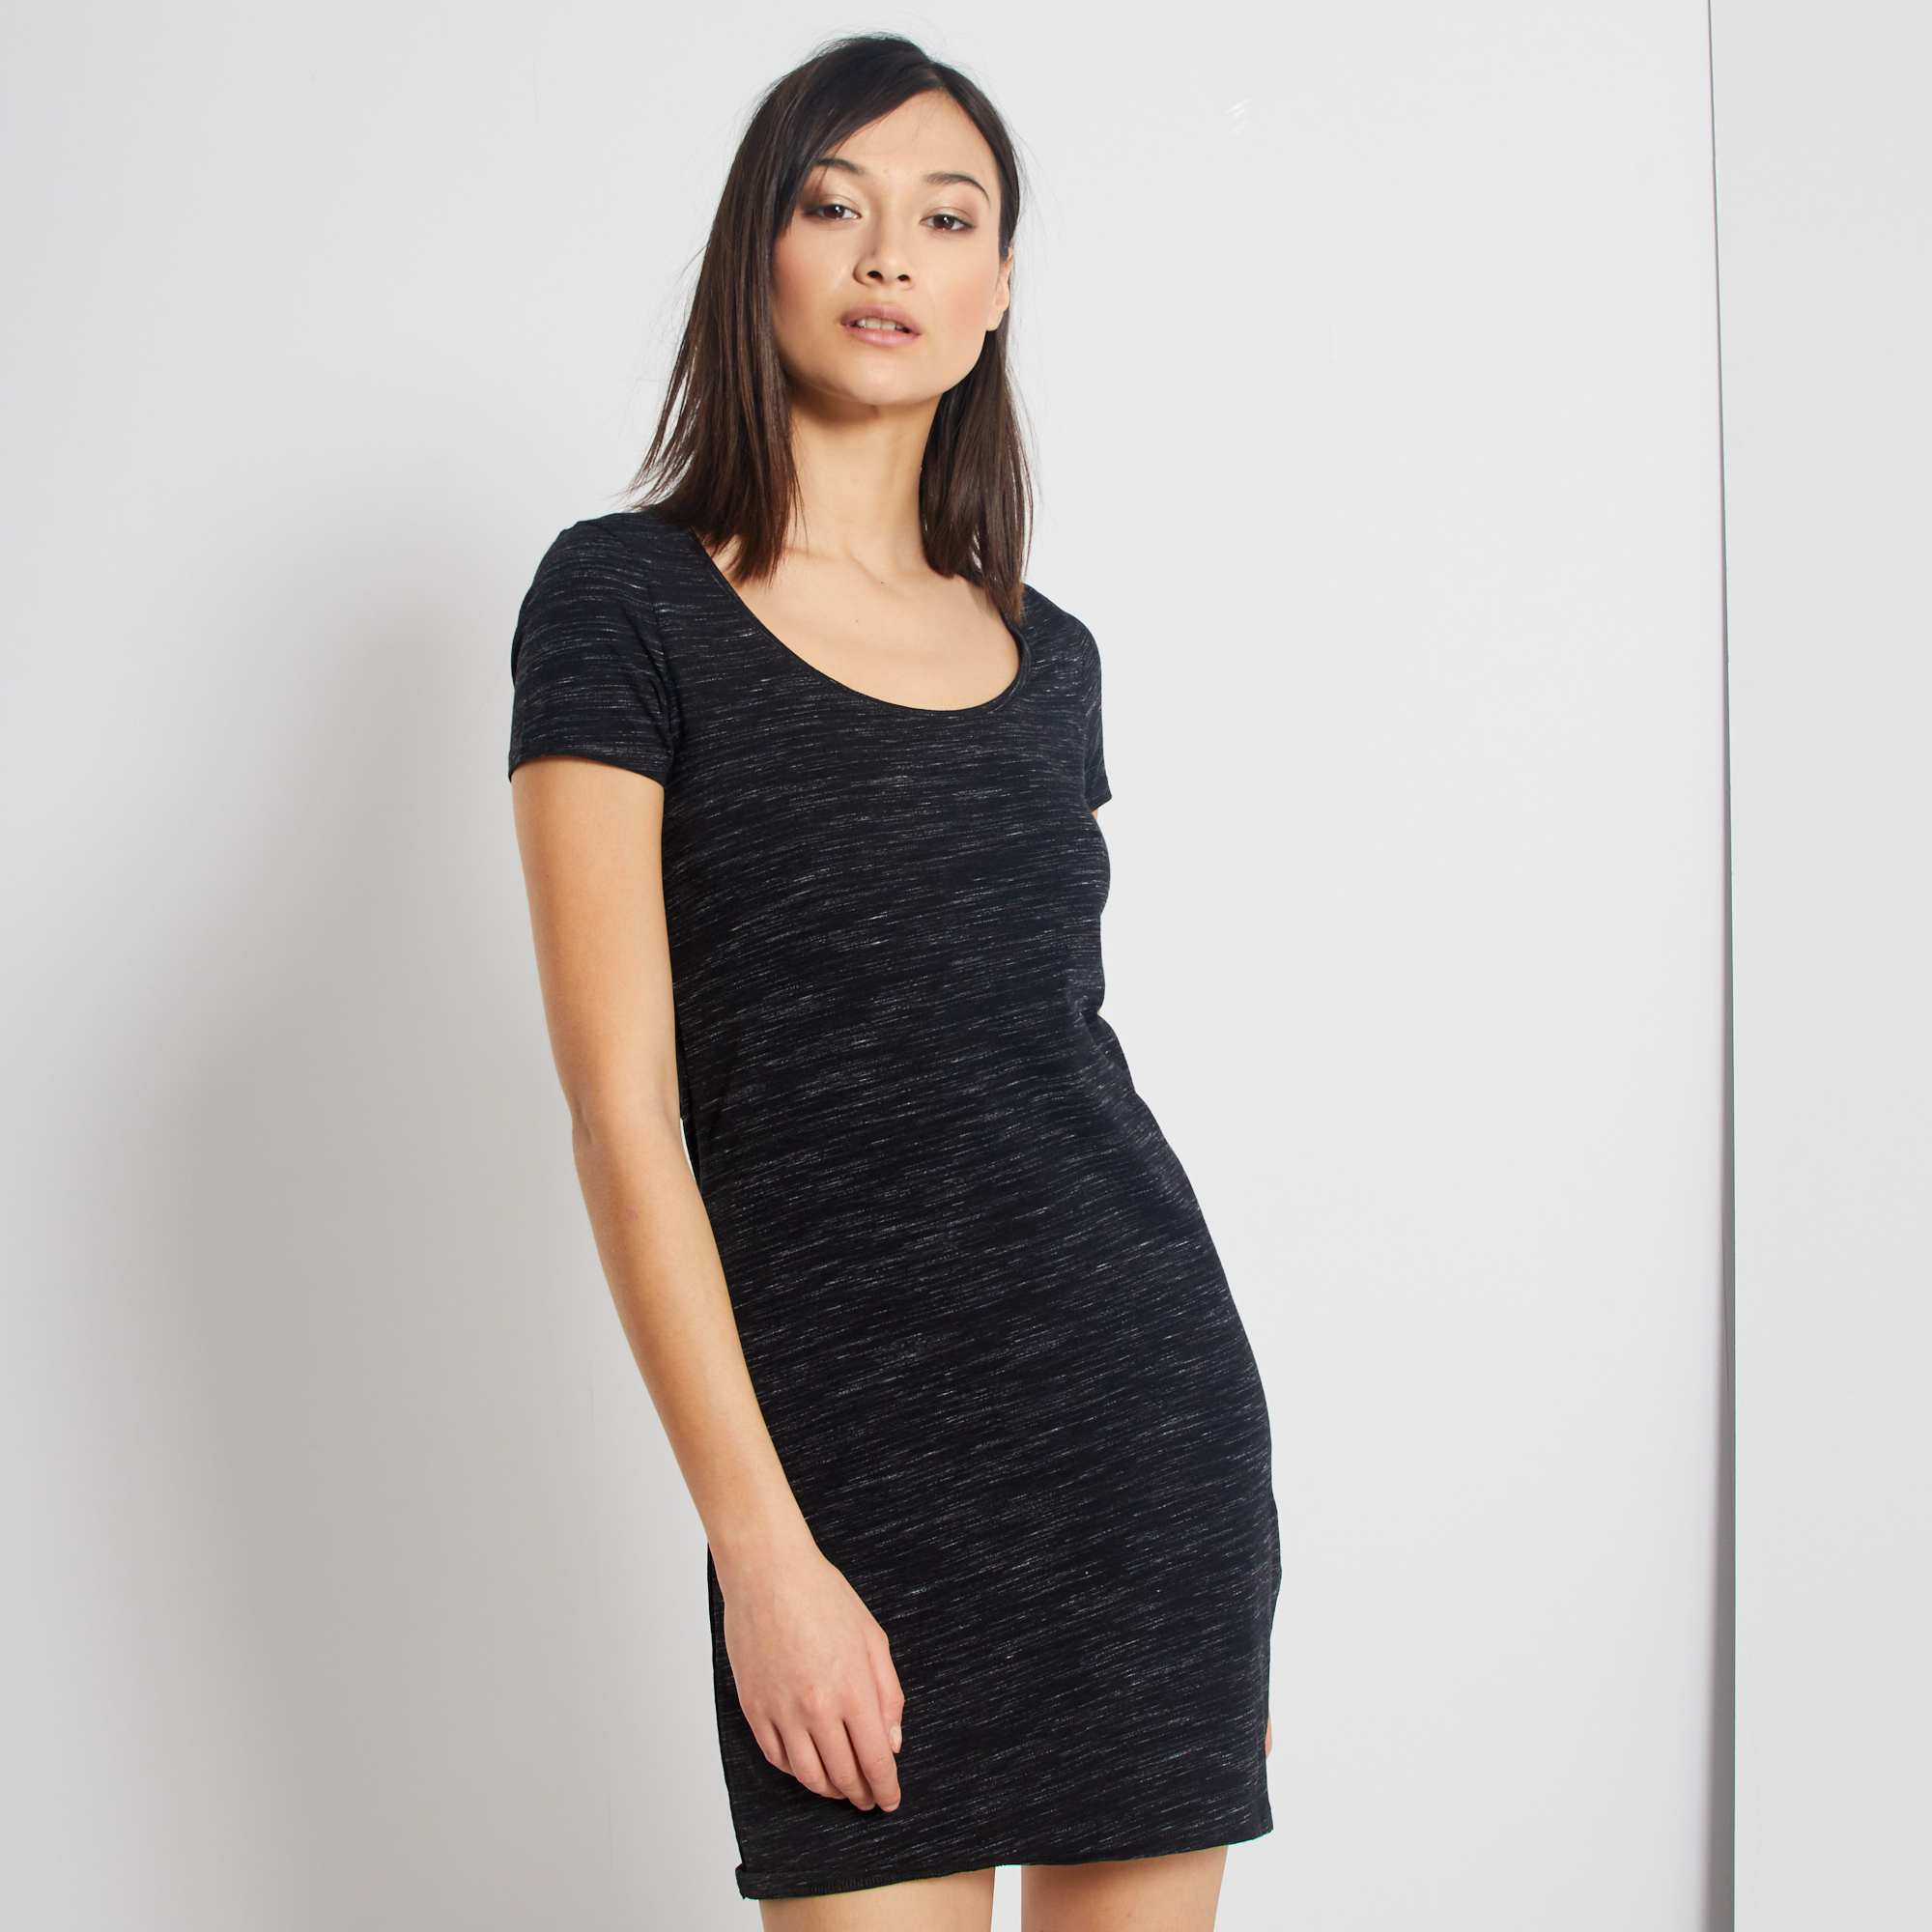 Vestido tipo camiseta Mujer - GRIS - Kiabi - 8,00€